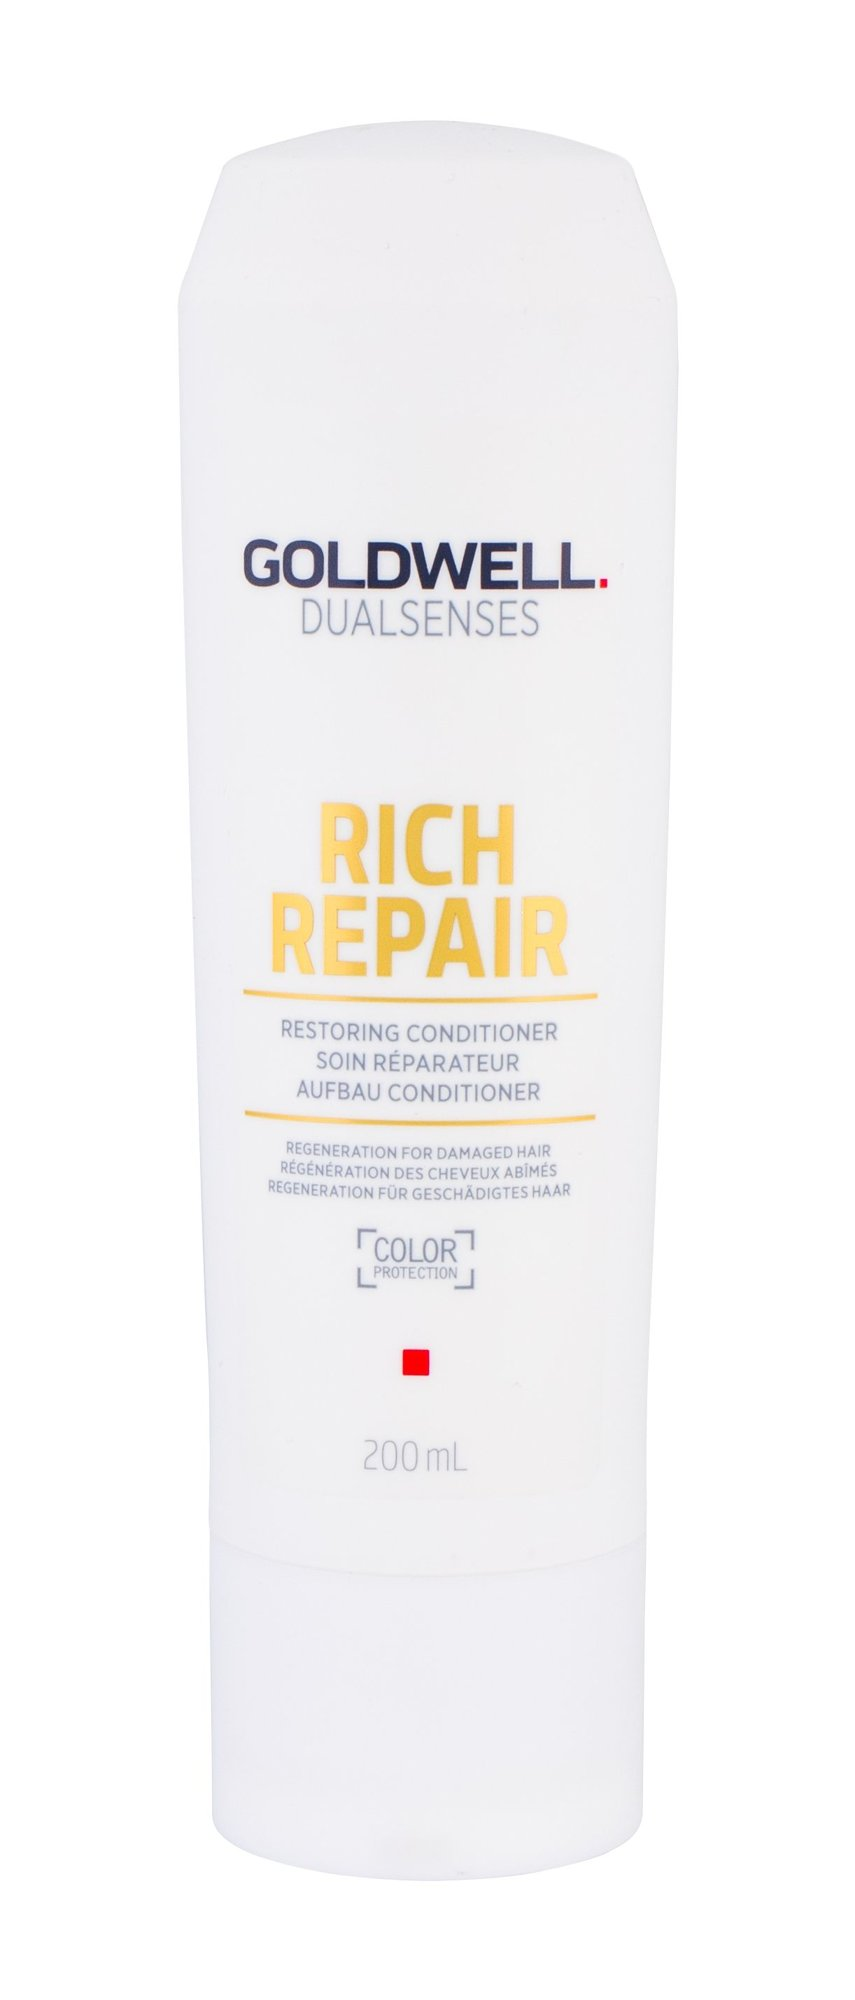 Plaukų kondicionierius Goldwell Dualsenses Rich Repair